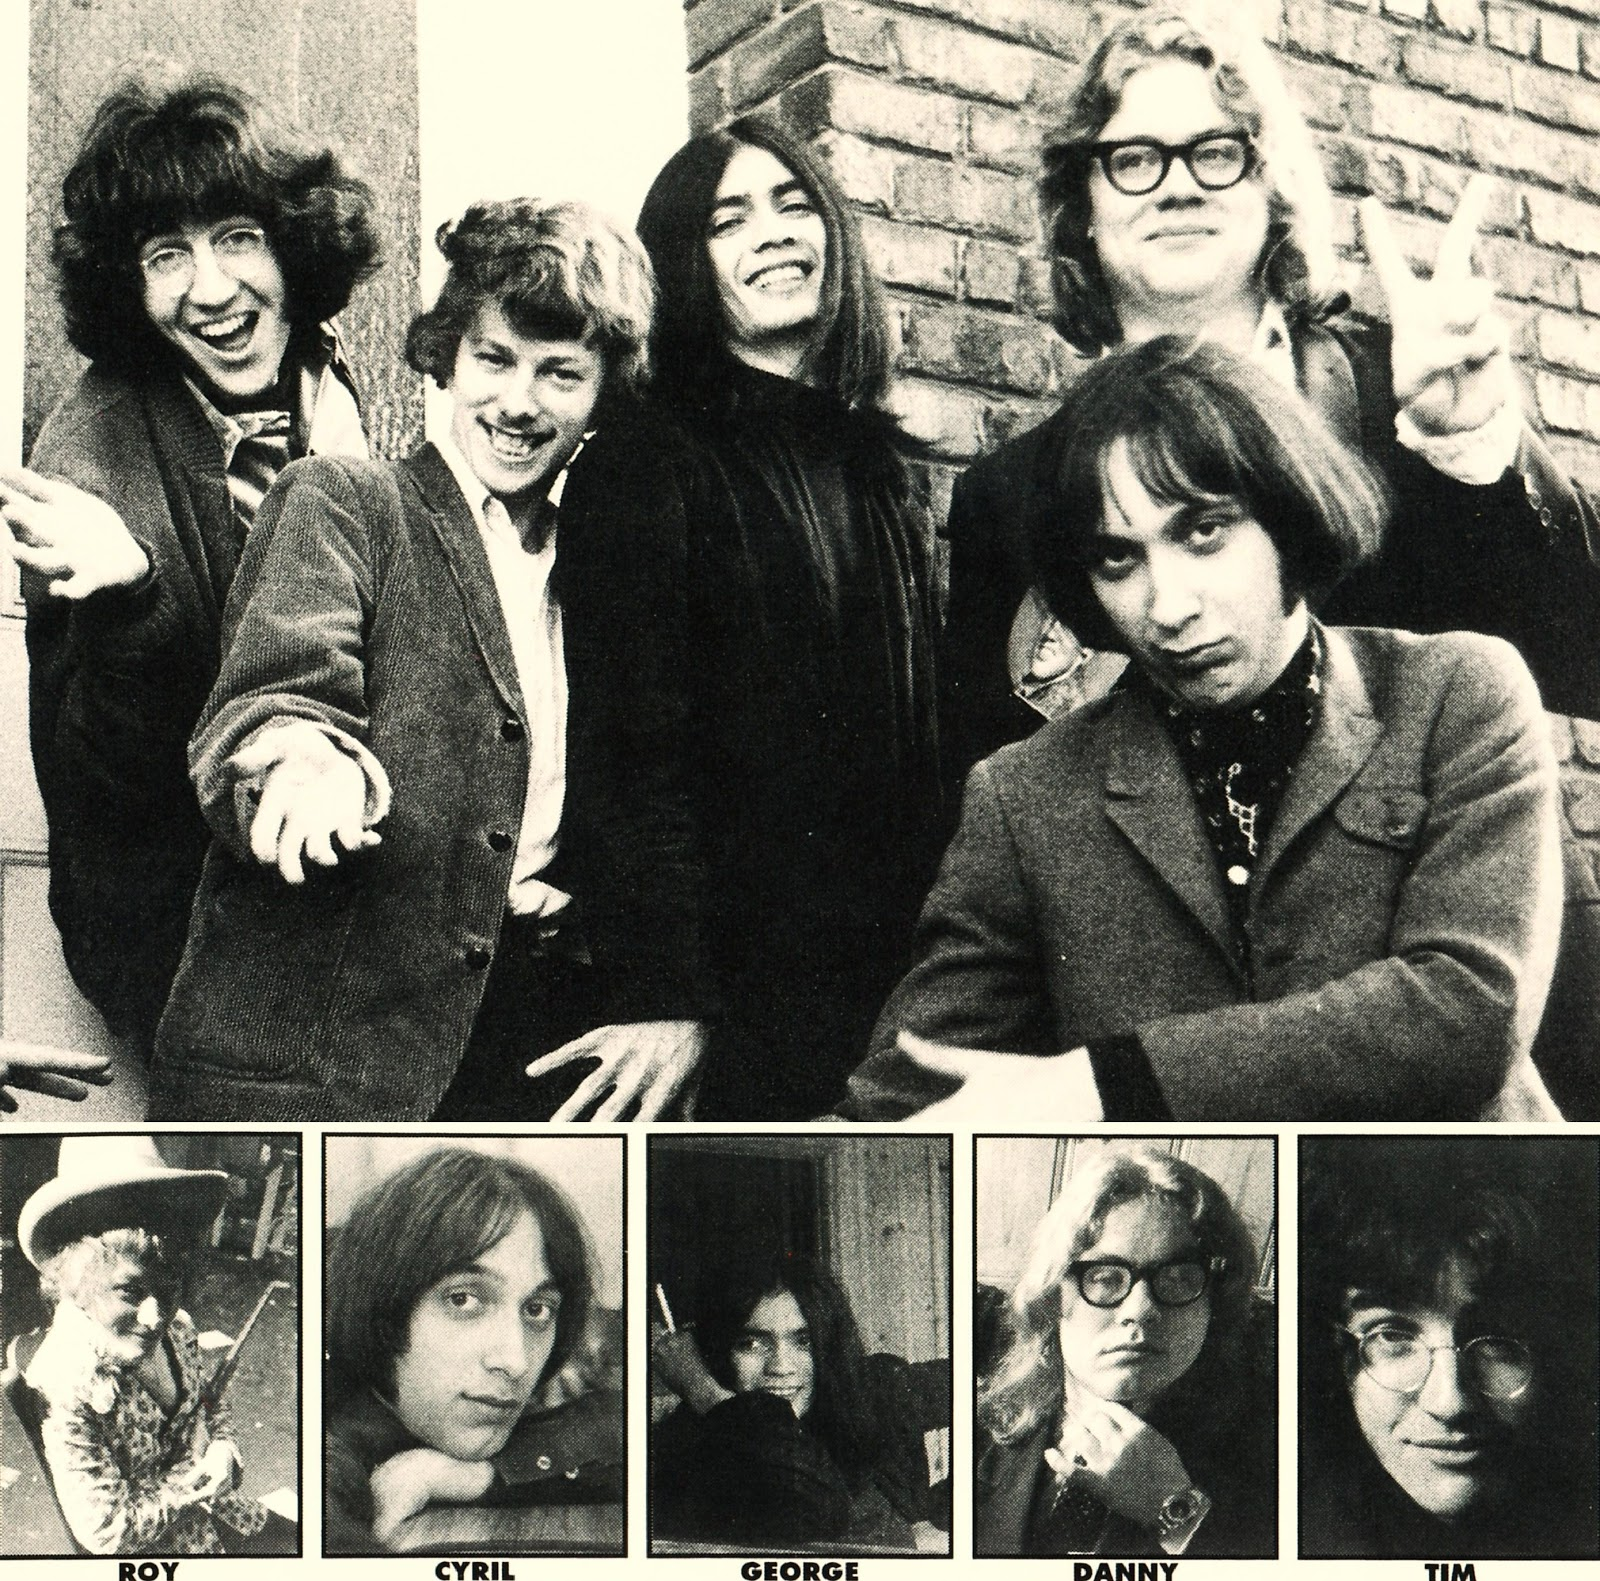 HOLA SOY EXTRATERRESTRE, ME ENSEÑAS ? - Página 6 Flamin%2527+Groovies+Photo+1969